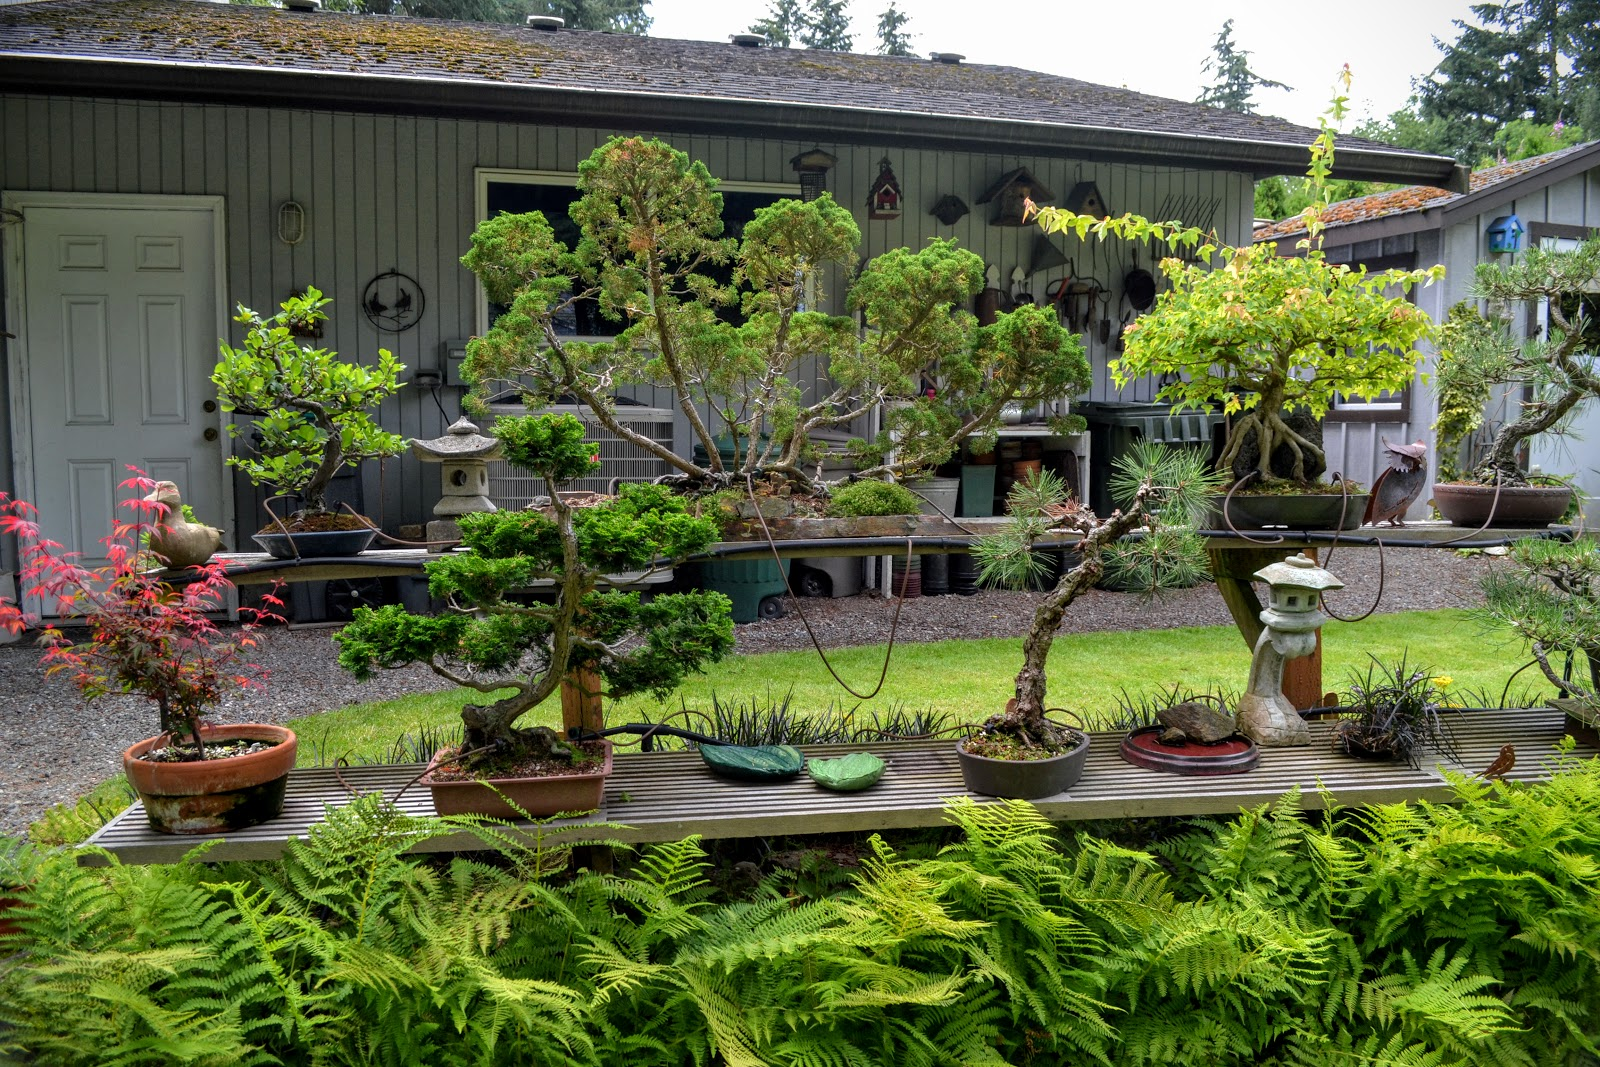 The Outlaw Gardener Revisiting Linda And Tom Reeder39s Seatac Garden